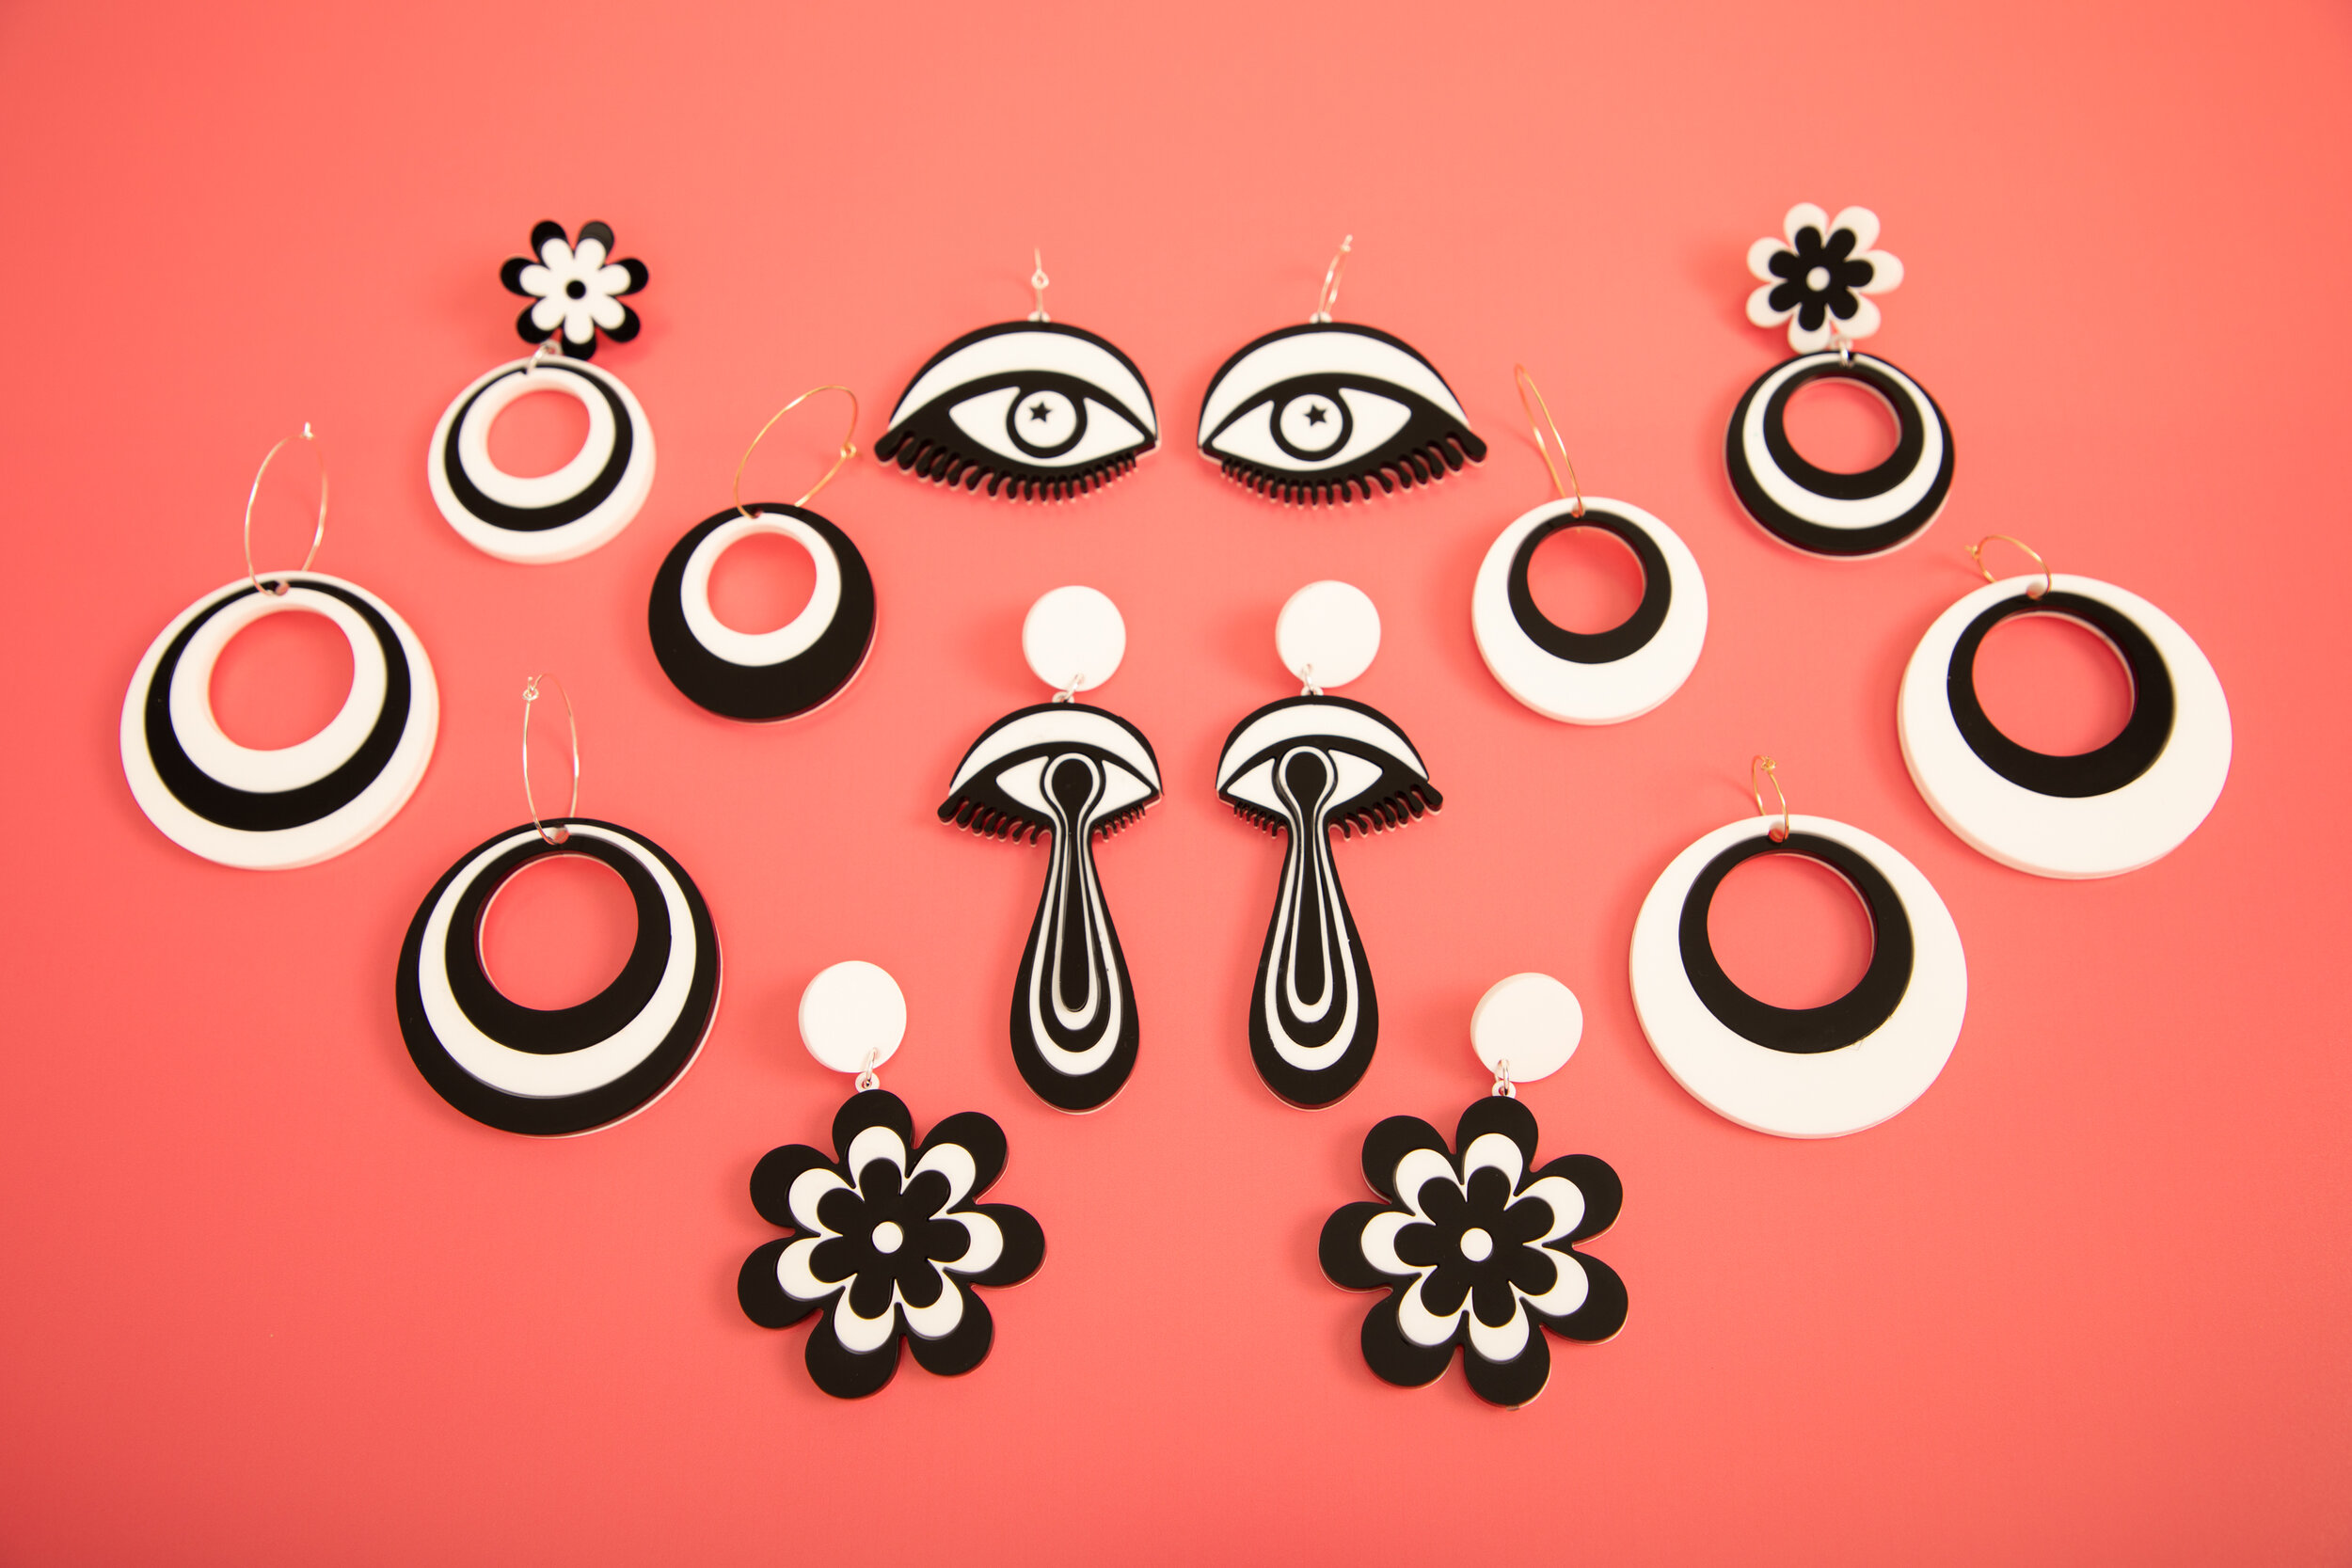 MindFlowers_Black_White_Eye_Oh_Mod_Candy_Daisy_Earrings.jpg